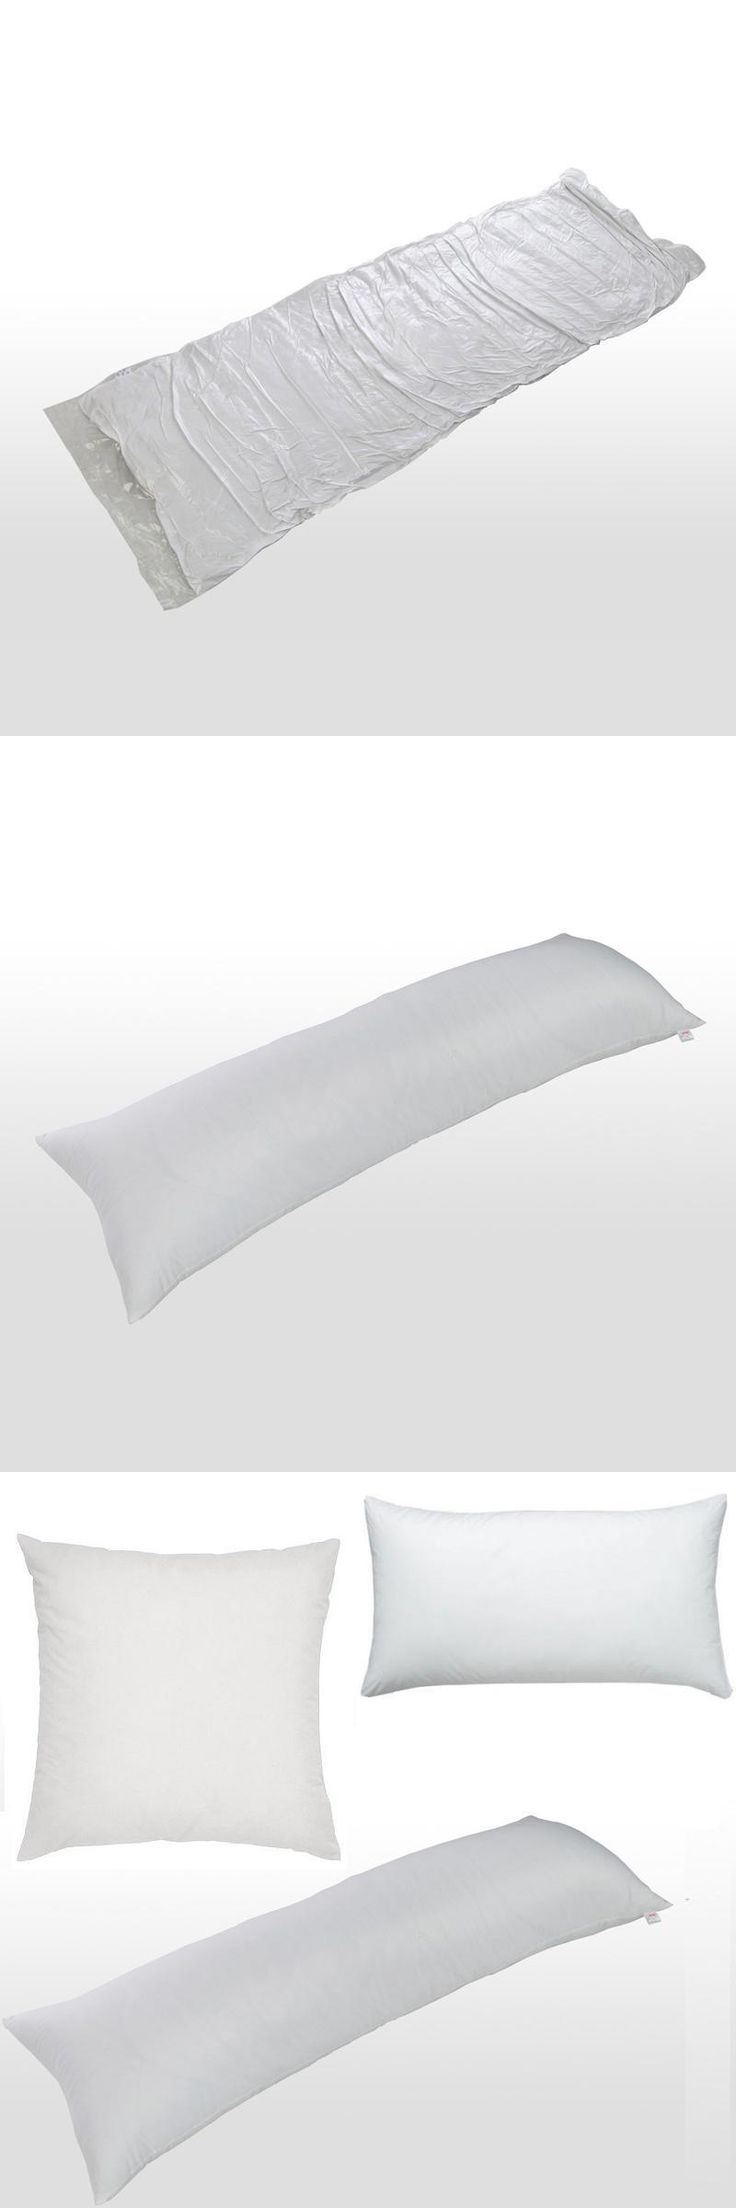 Anime Hugging Body Pillow Inner PP cotton pillow interior cushion filling Square Rectangular Throw pillows insert filler core